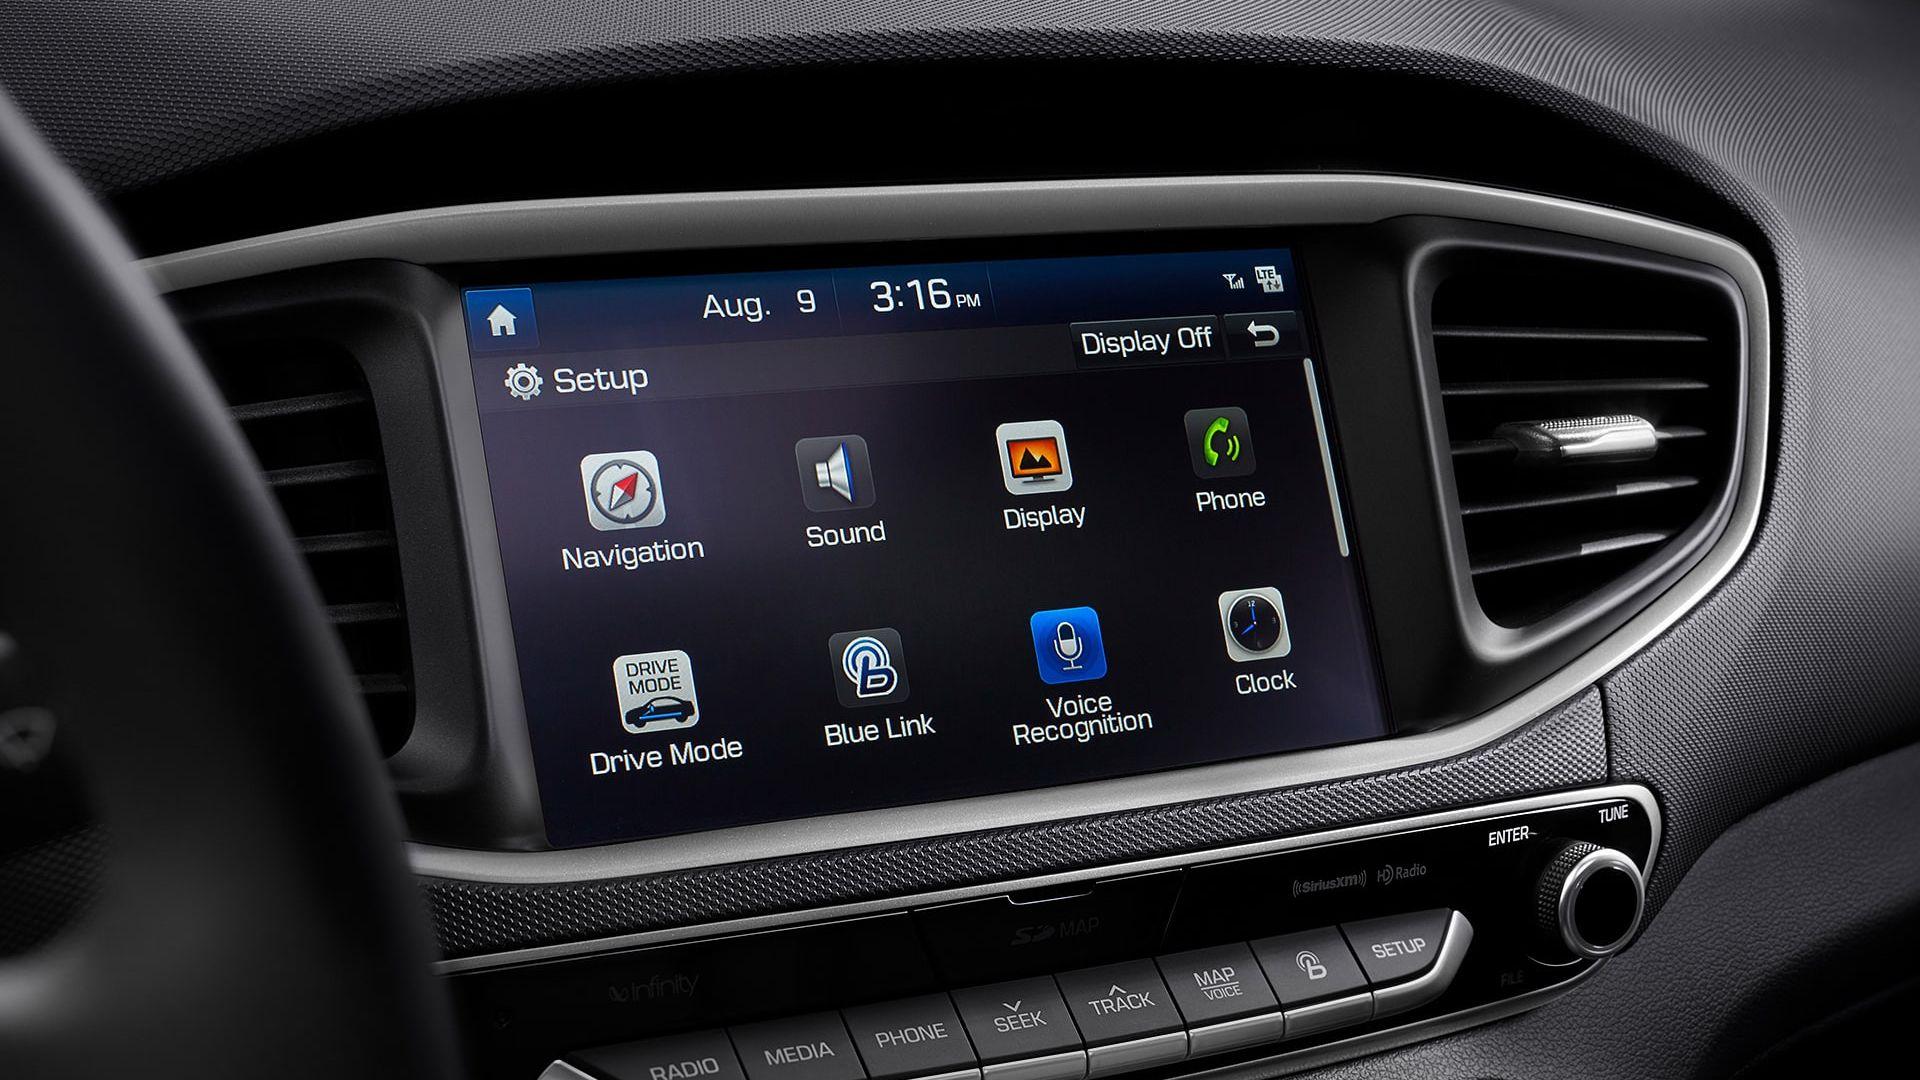 Touchscreen of the Hyundai Ioniq Electric